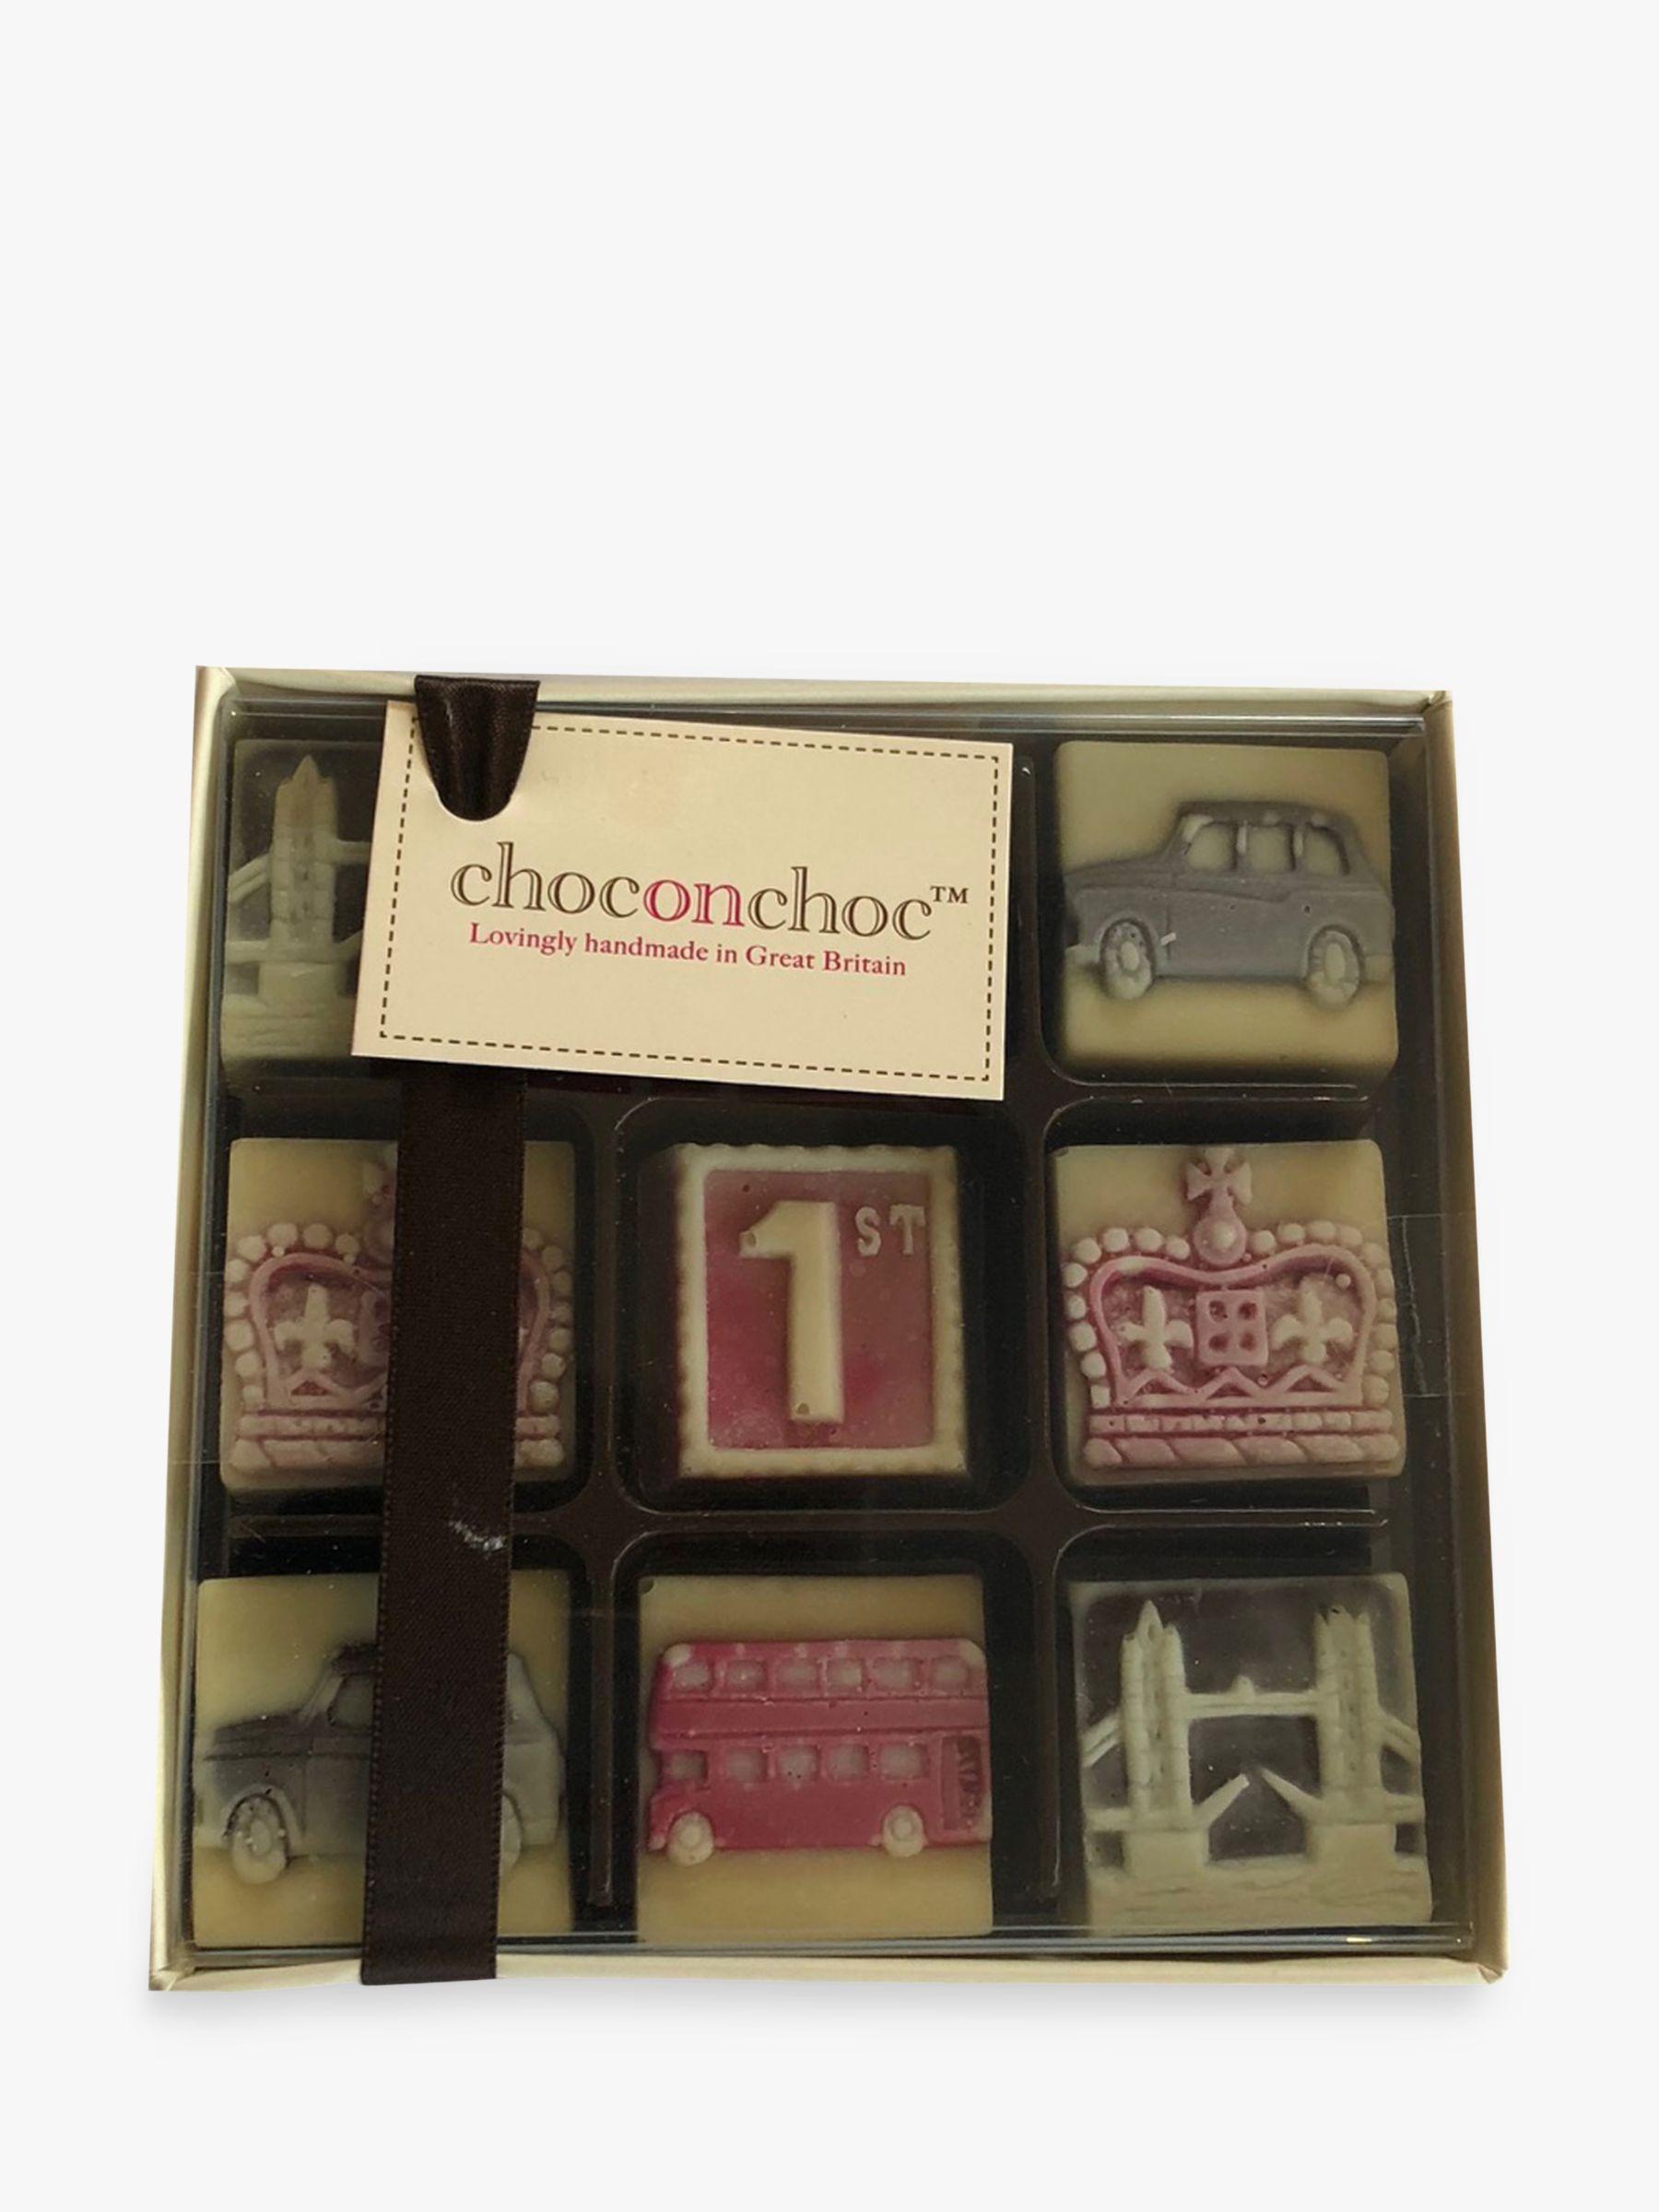 Choc on Choc Choc on Choc London Chocolates, 110g